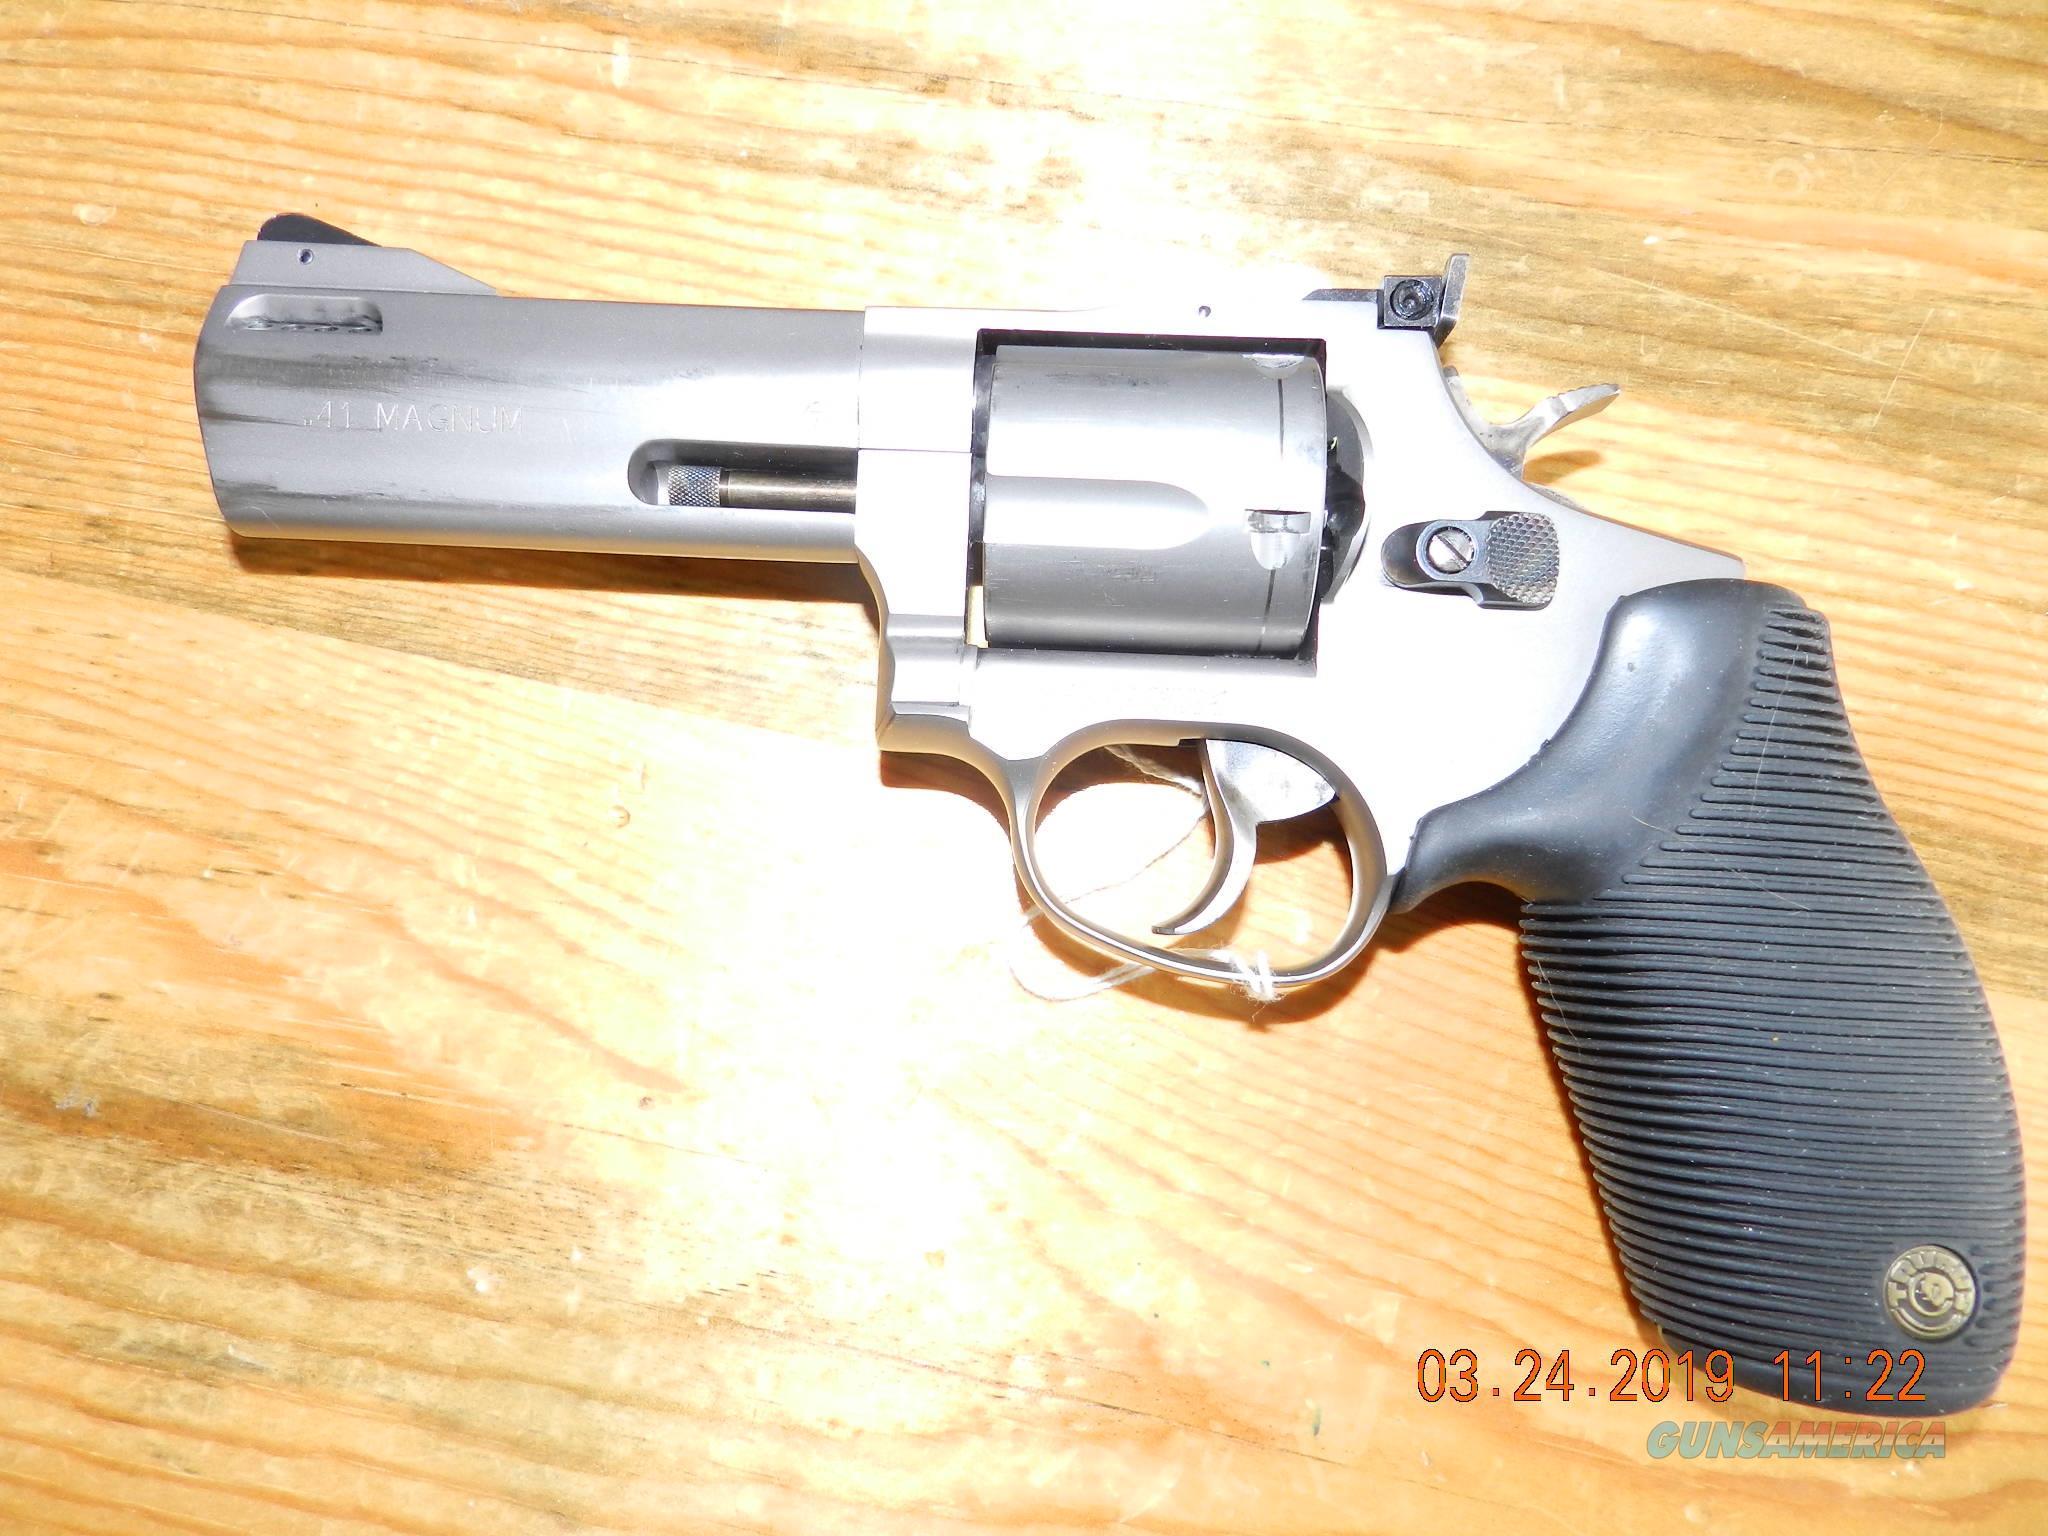 Taurus titanium 41 magmun 4 inch   Guns > Pistols > Taurus Pistols > Revolvers